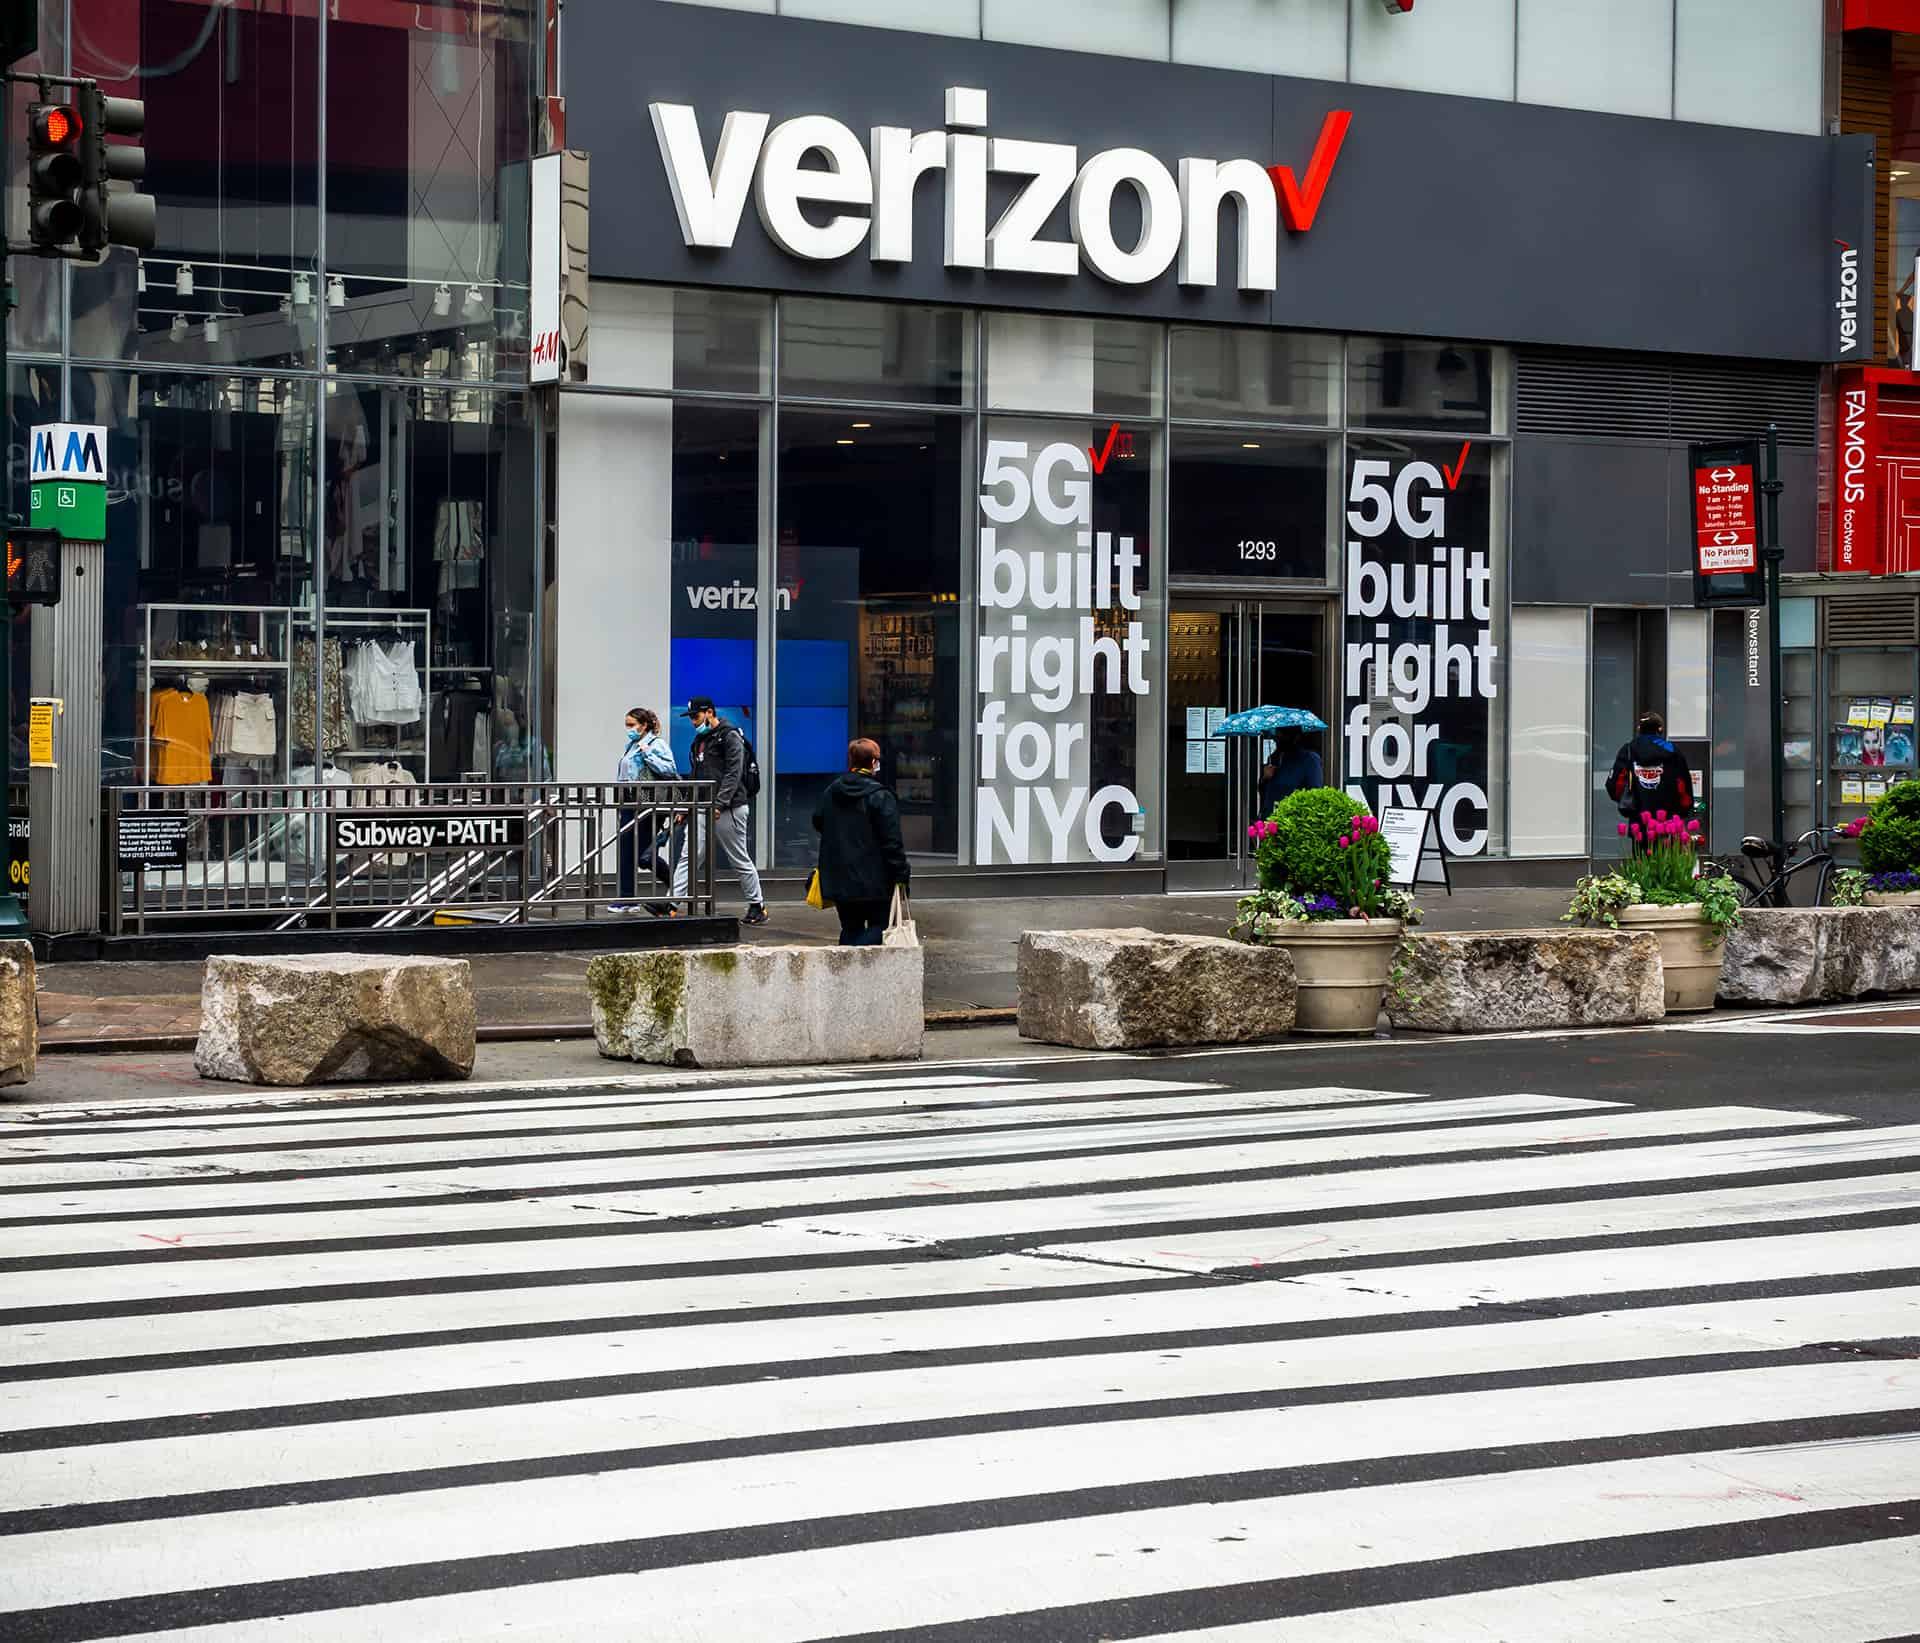 verizon new york